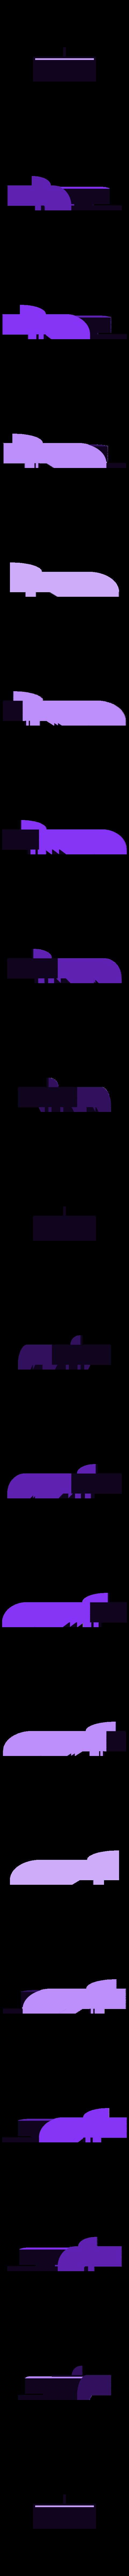 TinyboatMK2.stl Download free STL file Tiny Boat MK2 • 3D printer object, Gophy